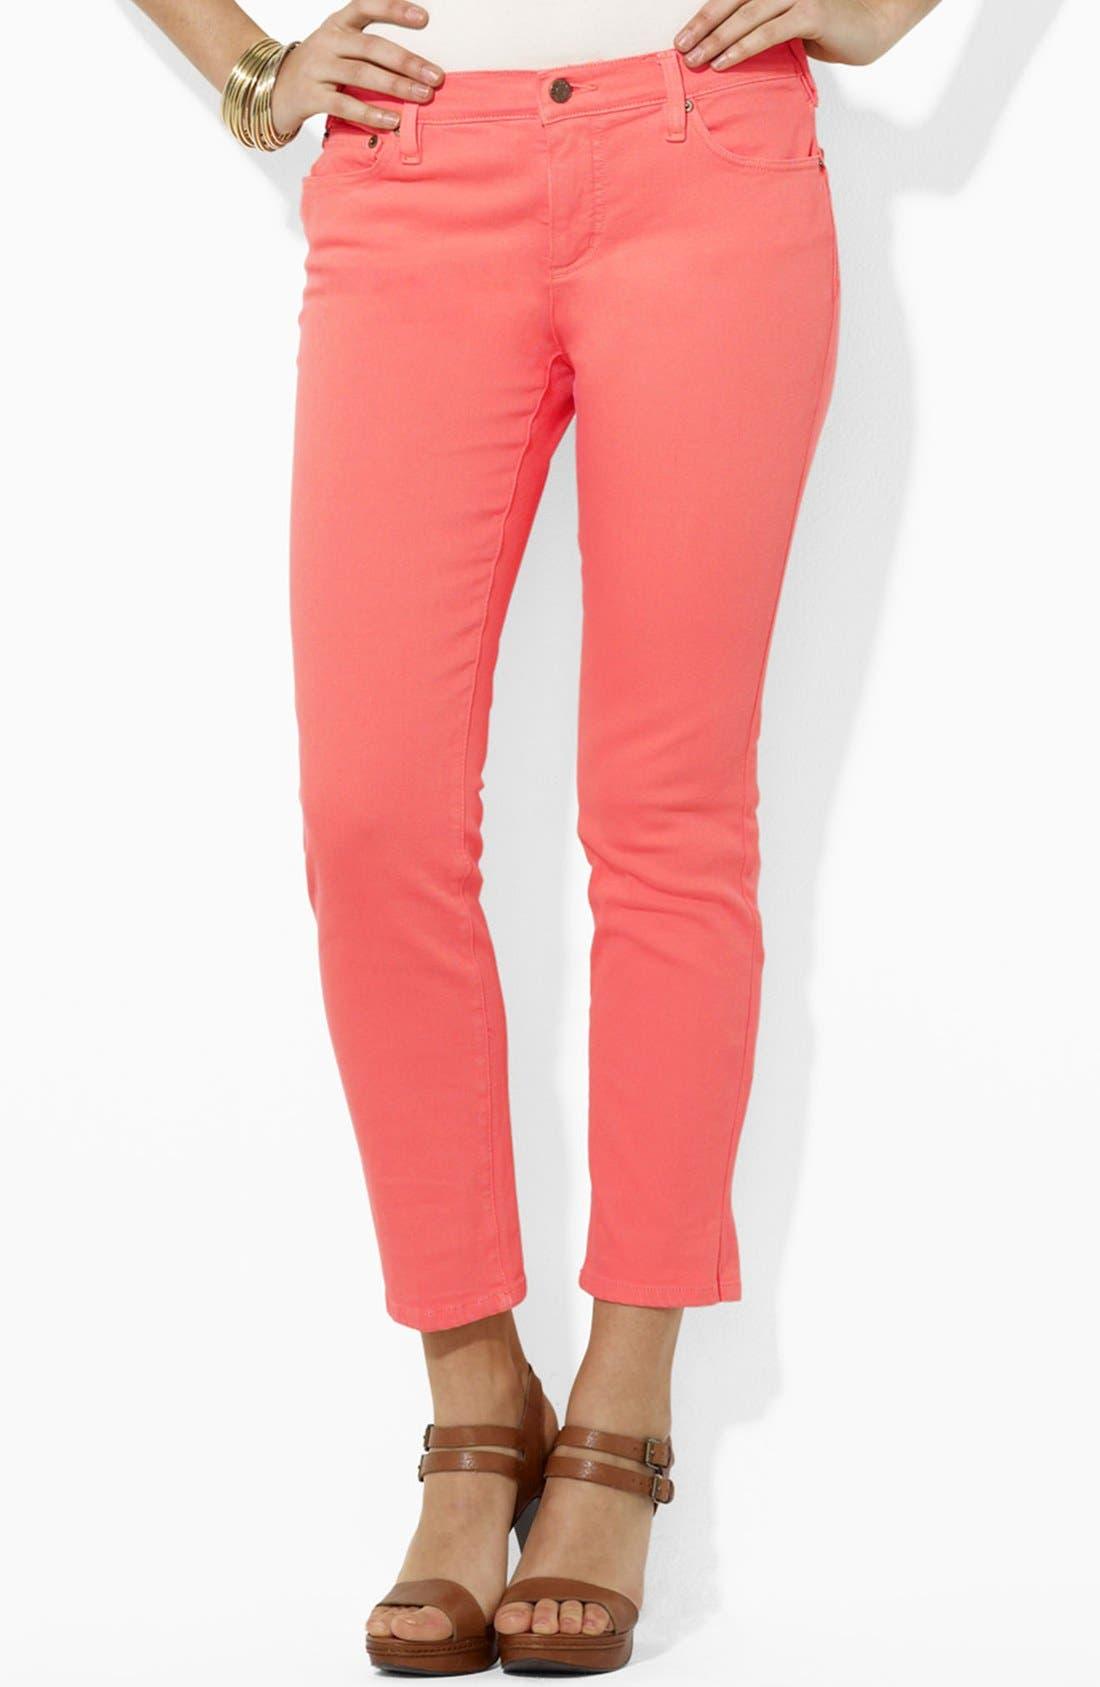 Alternate Image 1 Selected - Lauren Ralph Lauren Slimming Straight Leg Ankle Pants (Petite) (Online Only)